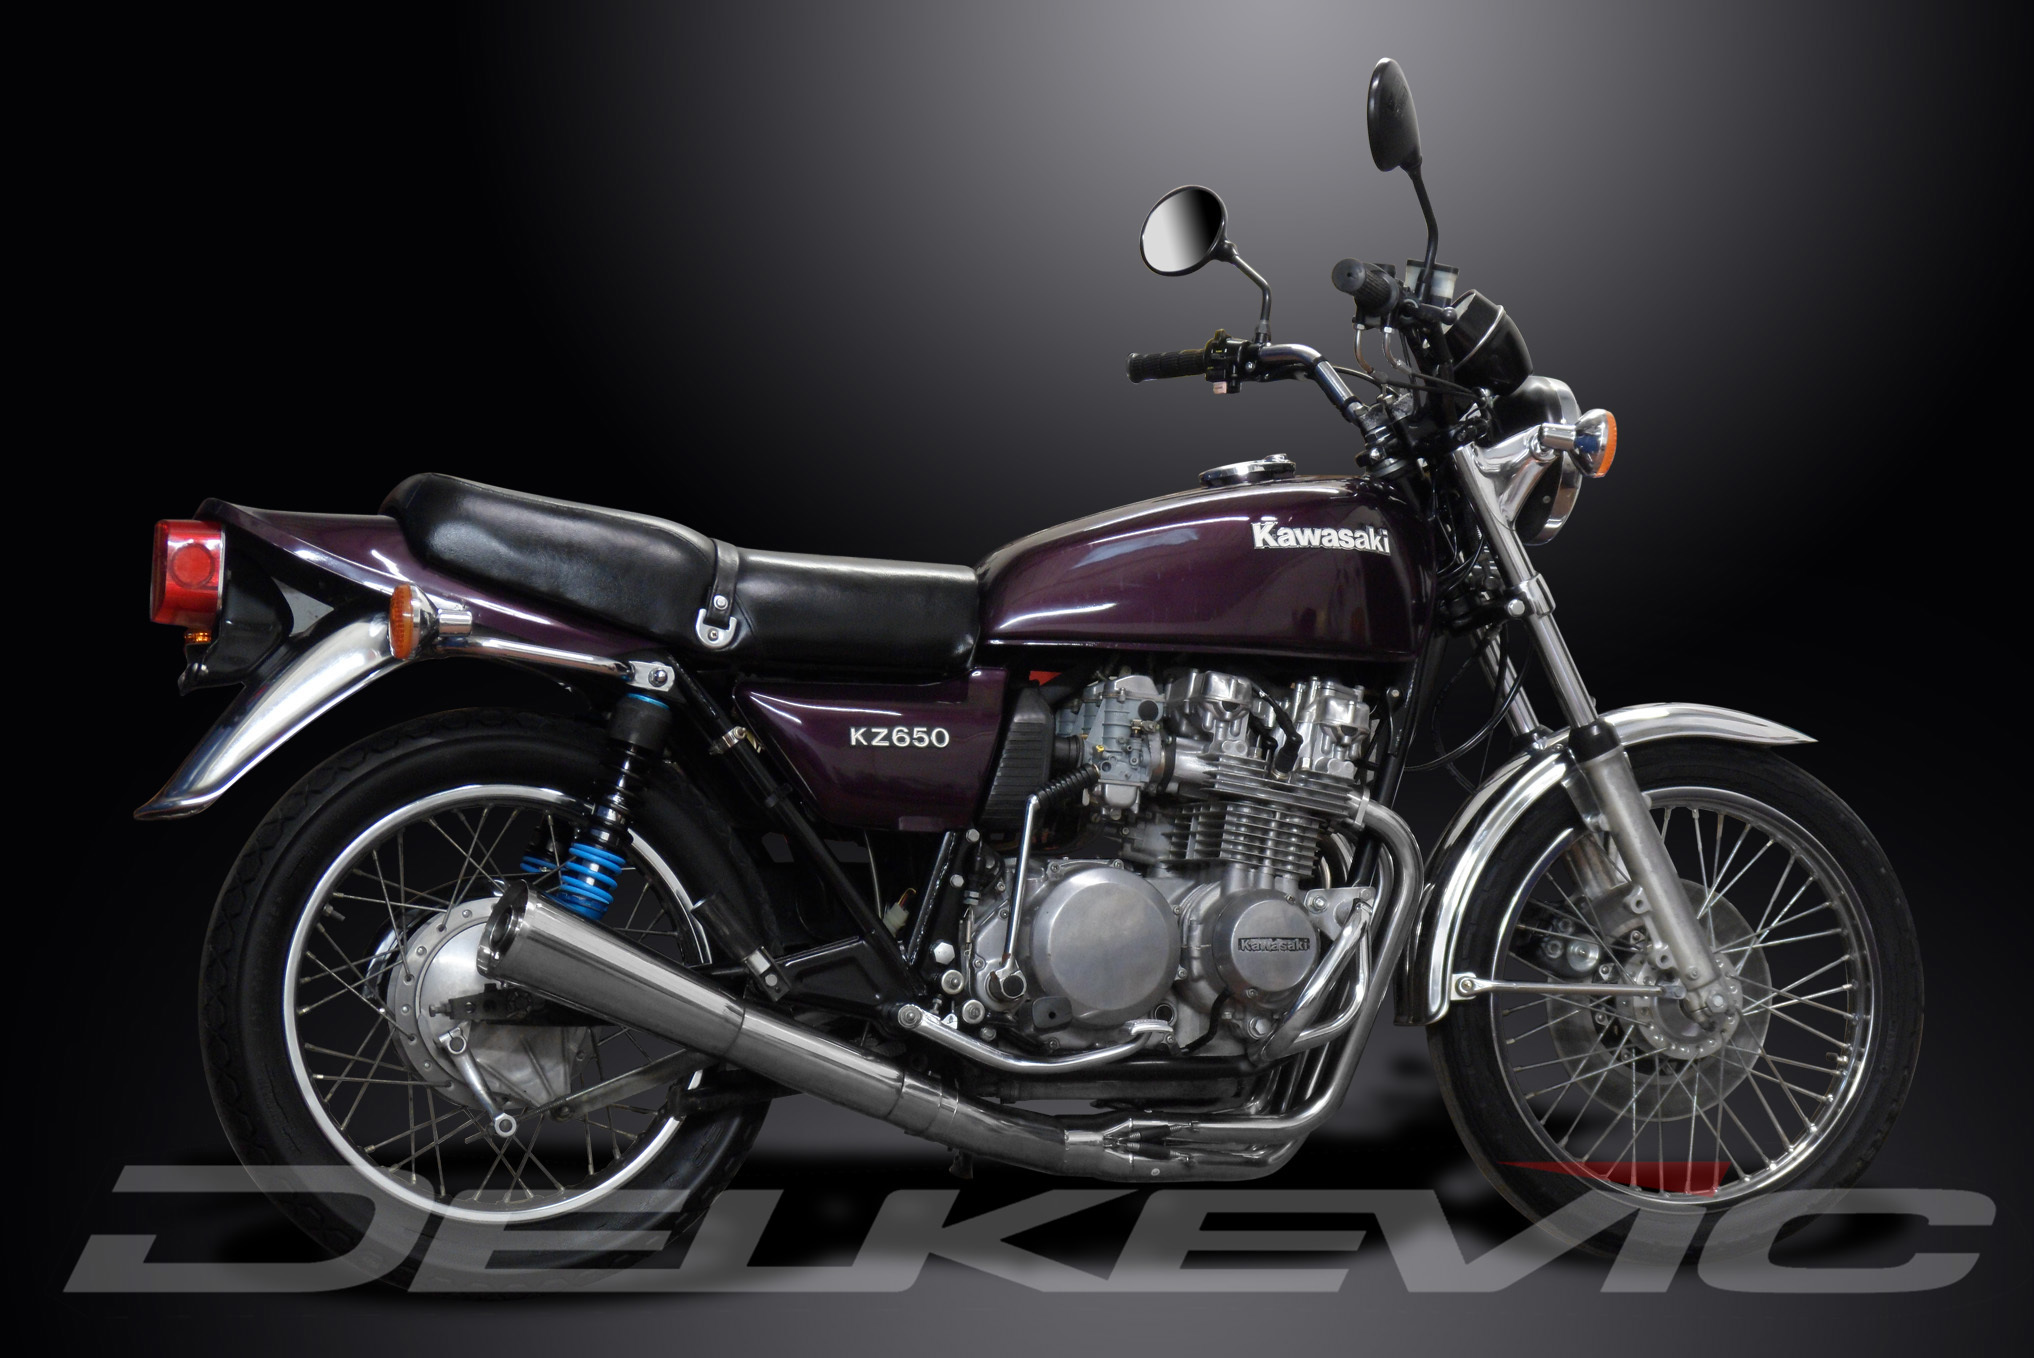 KZ750 All Submodels